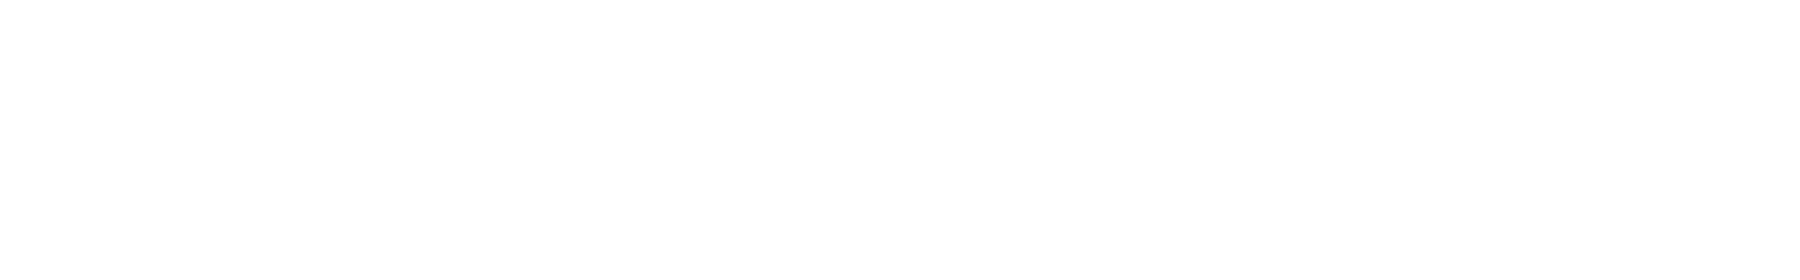 shg percussion loop 10